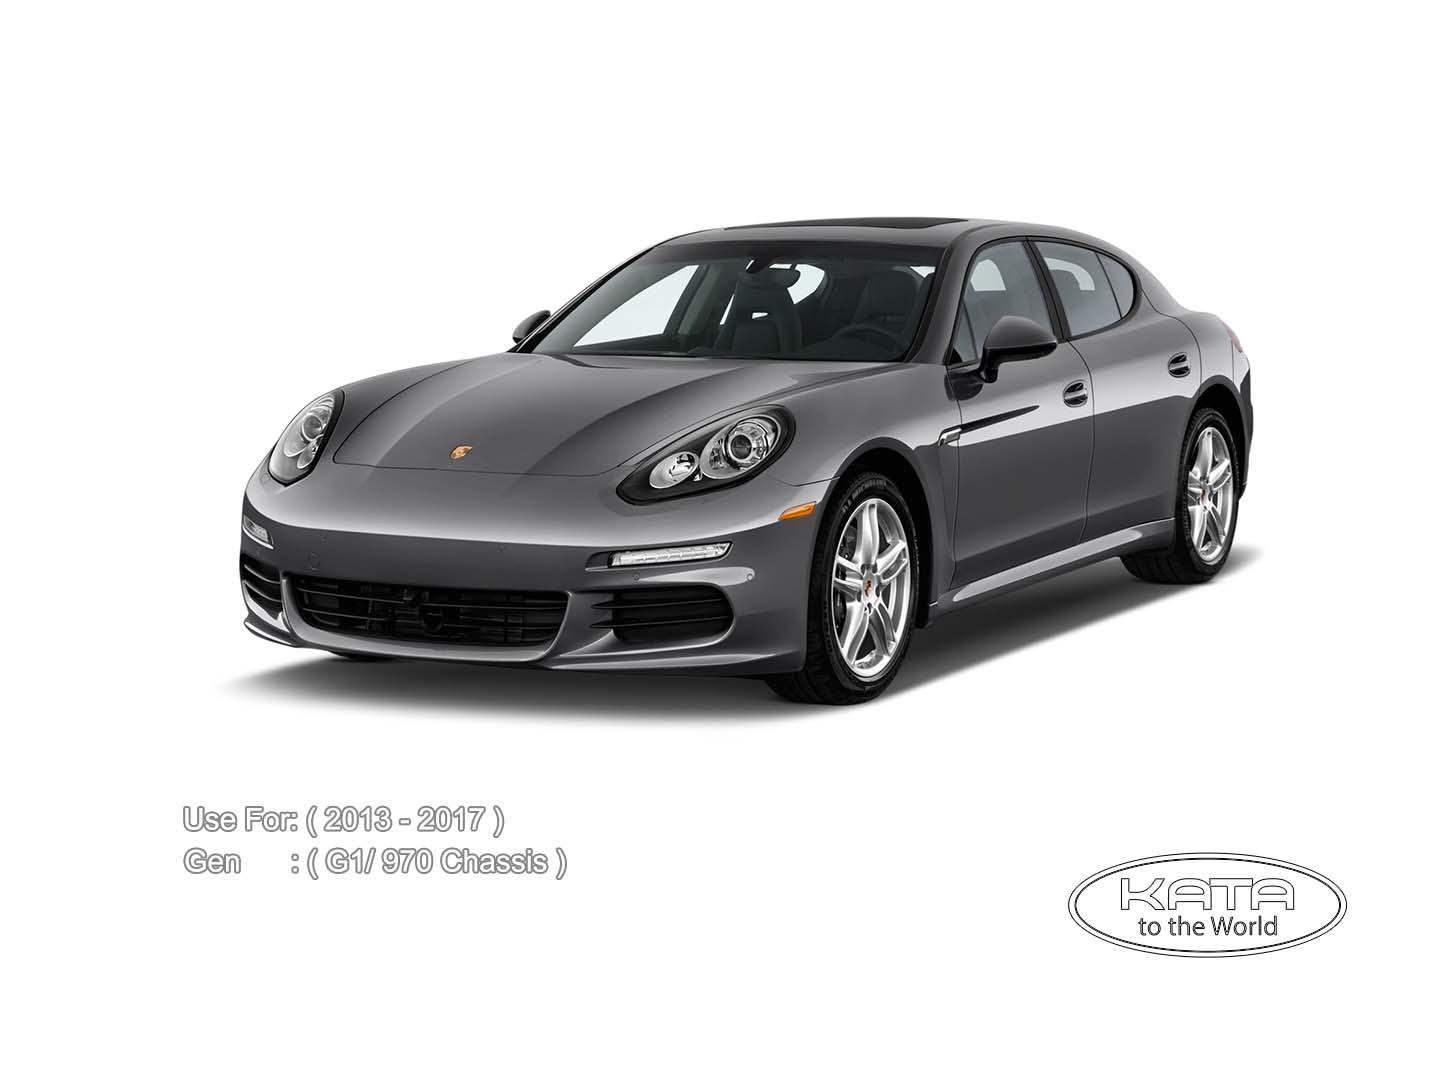 backliners-Porsche-Panamera-G1